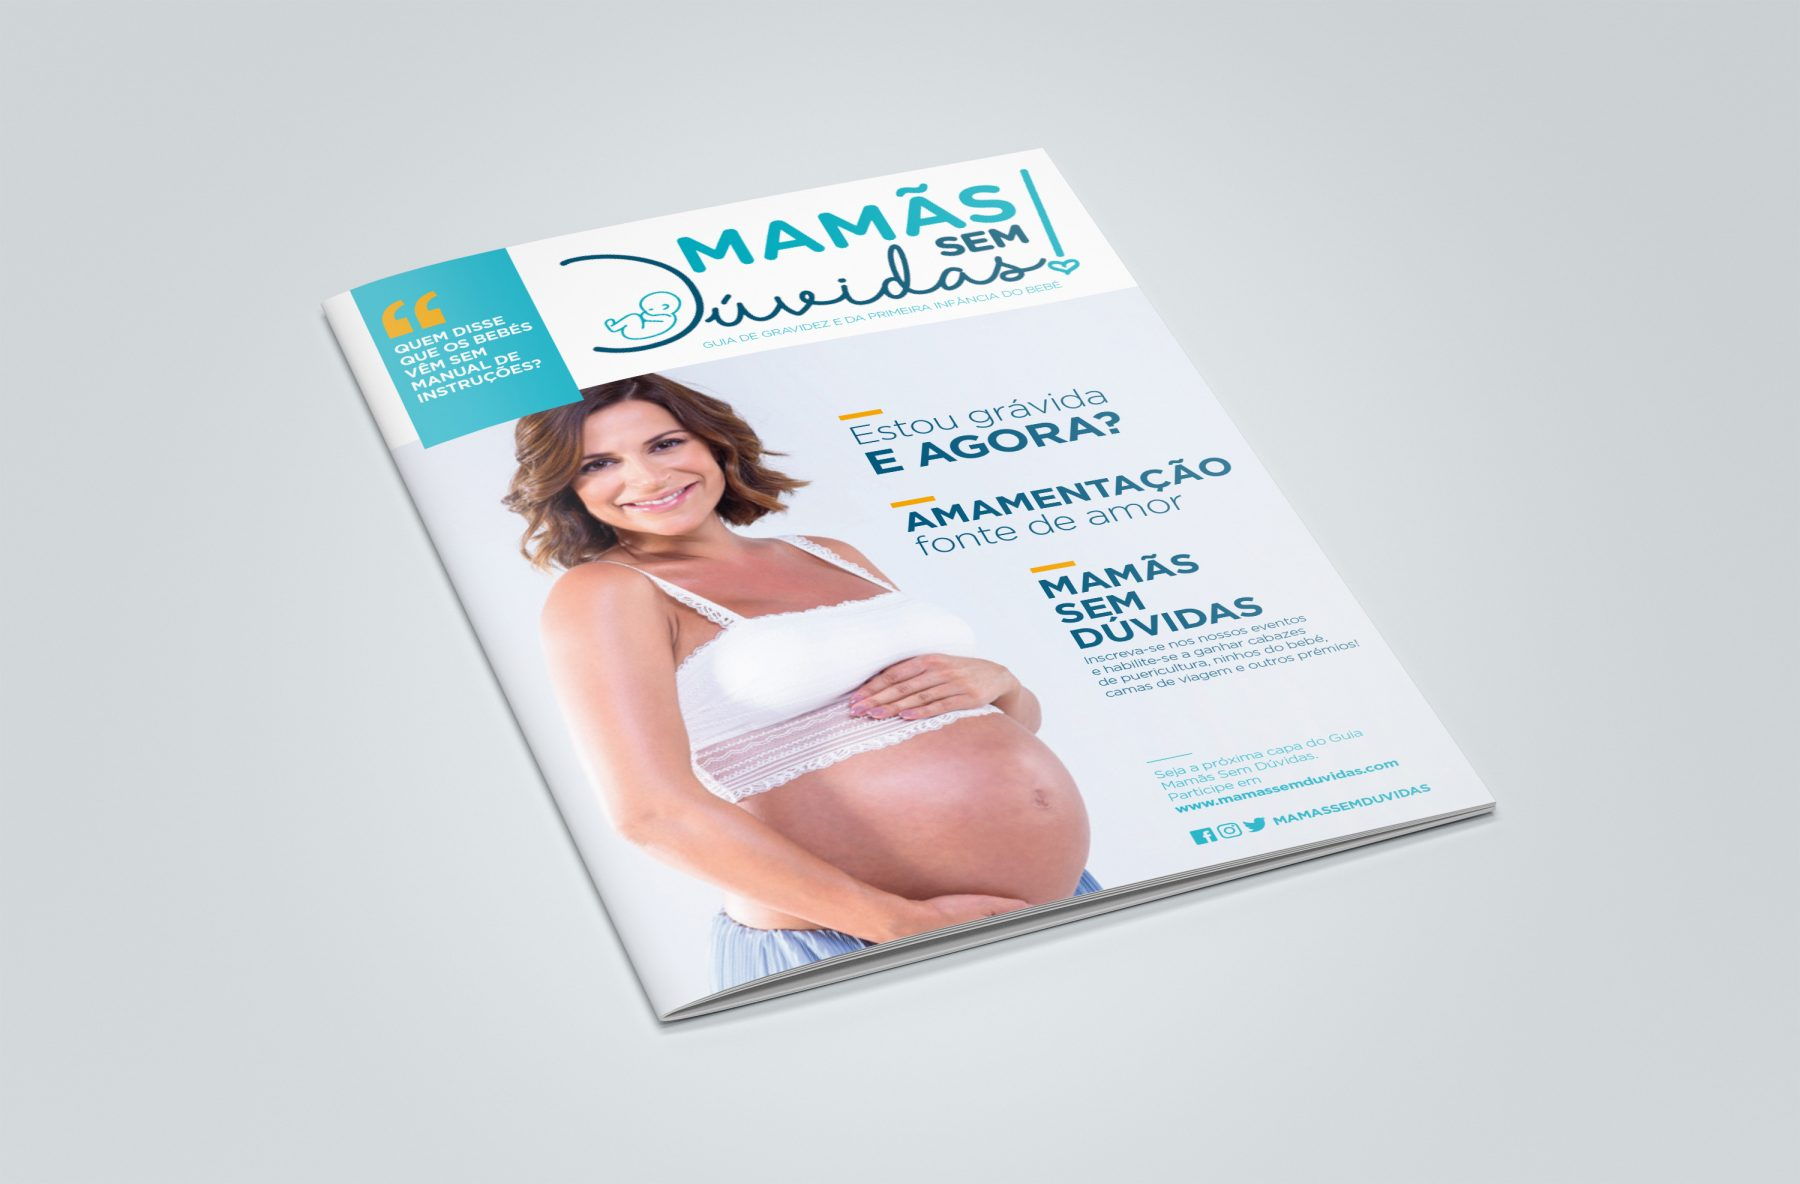 BBV_MamasSemDuvidas_guiadegravidez_1